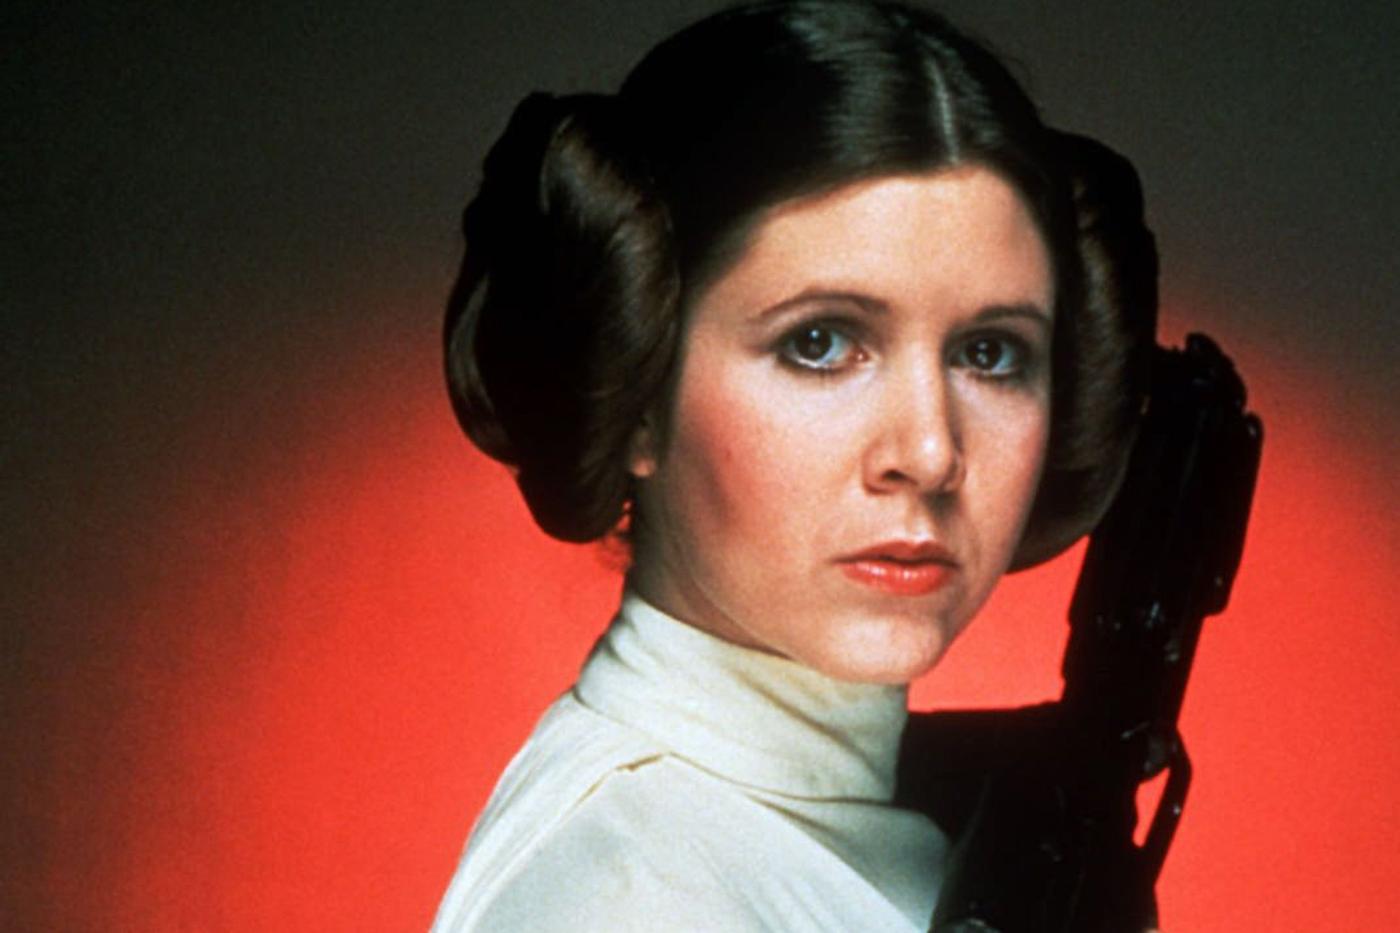 Hero or Hype? Princess Leia